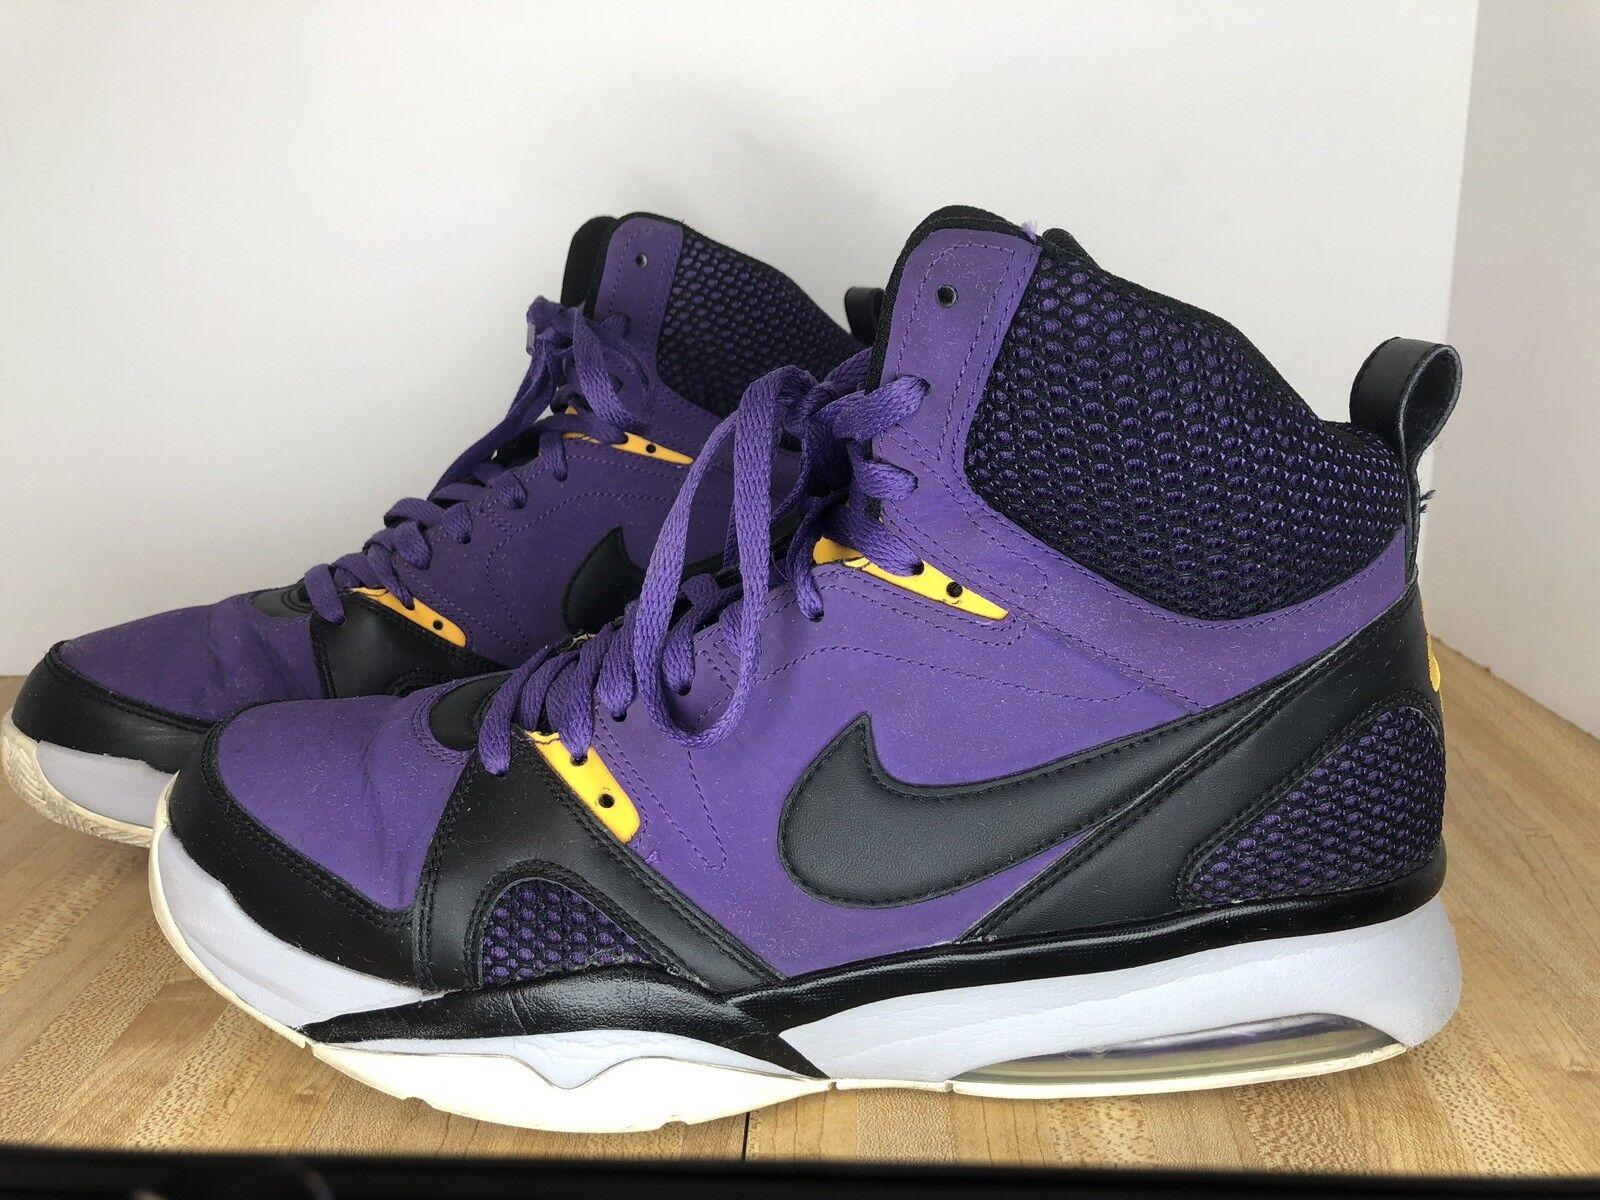 Nike Force LA LAKERS PURPLE gold shoes 55087-500 Size 12